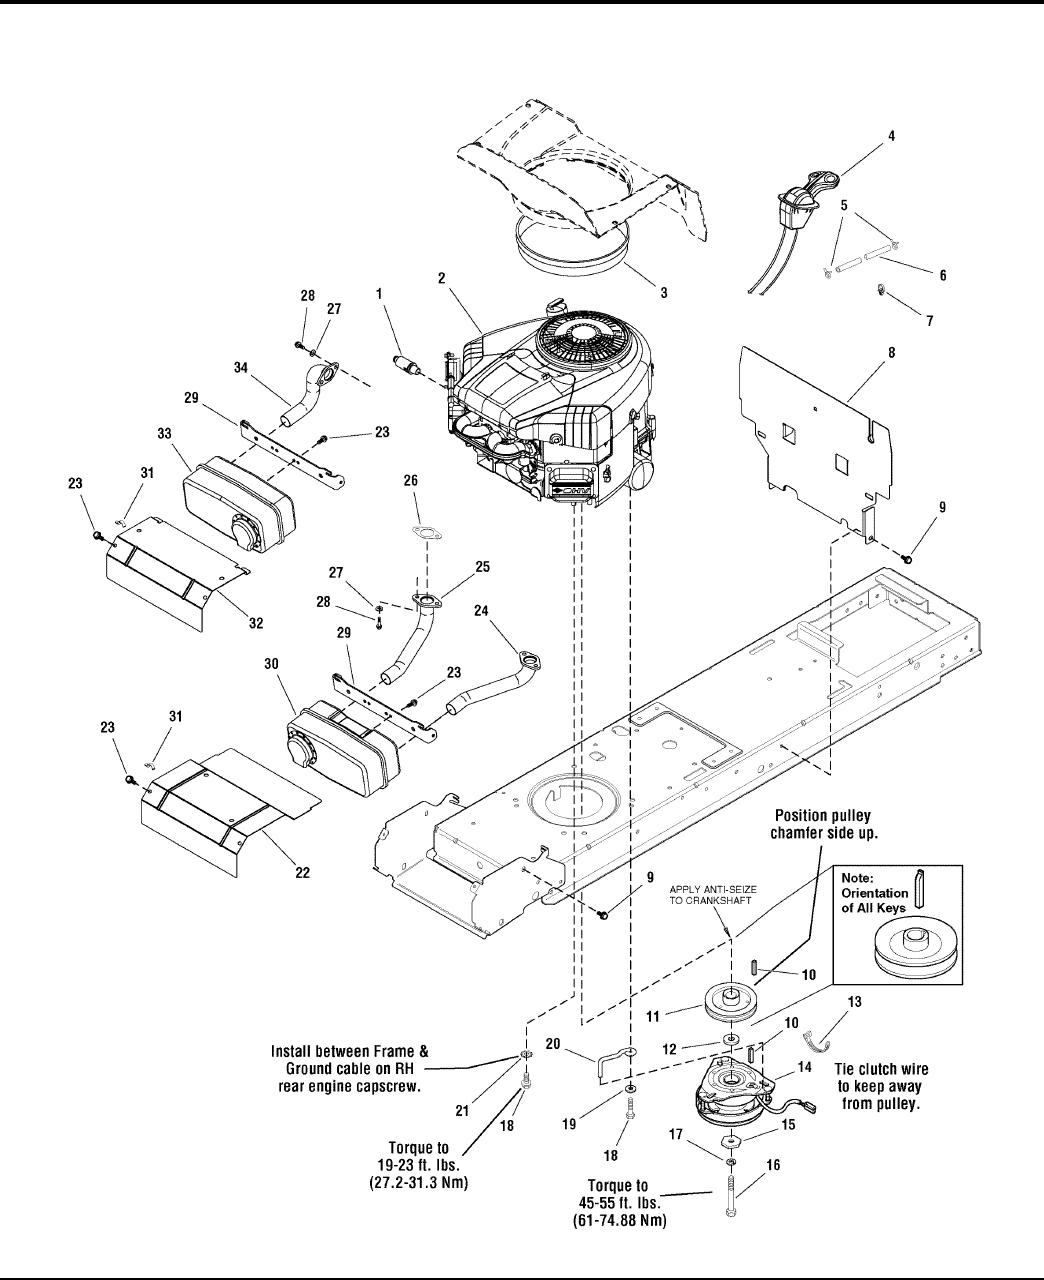 Simplicity 18 5Hp Parts Manual Regent / 500 2500 Series